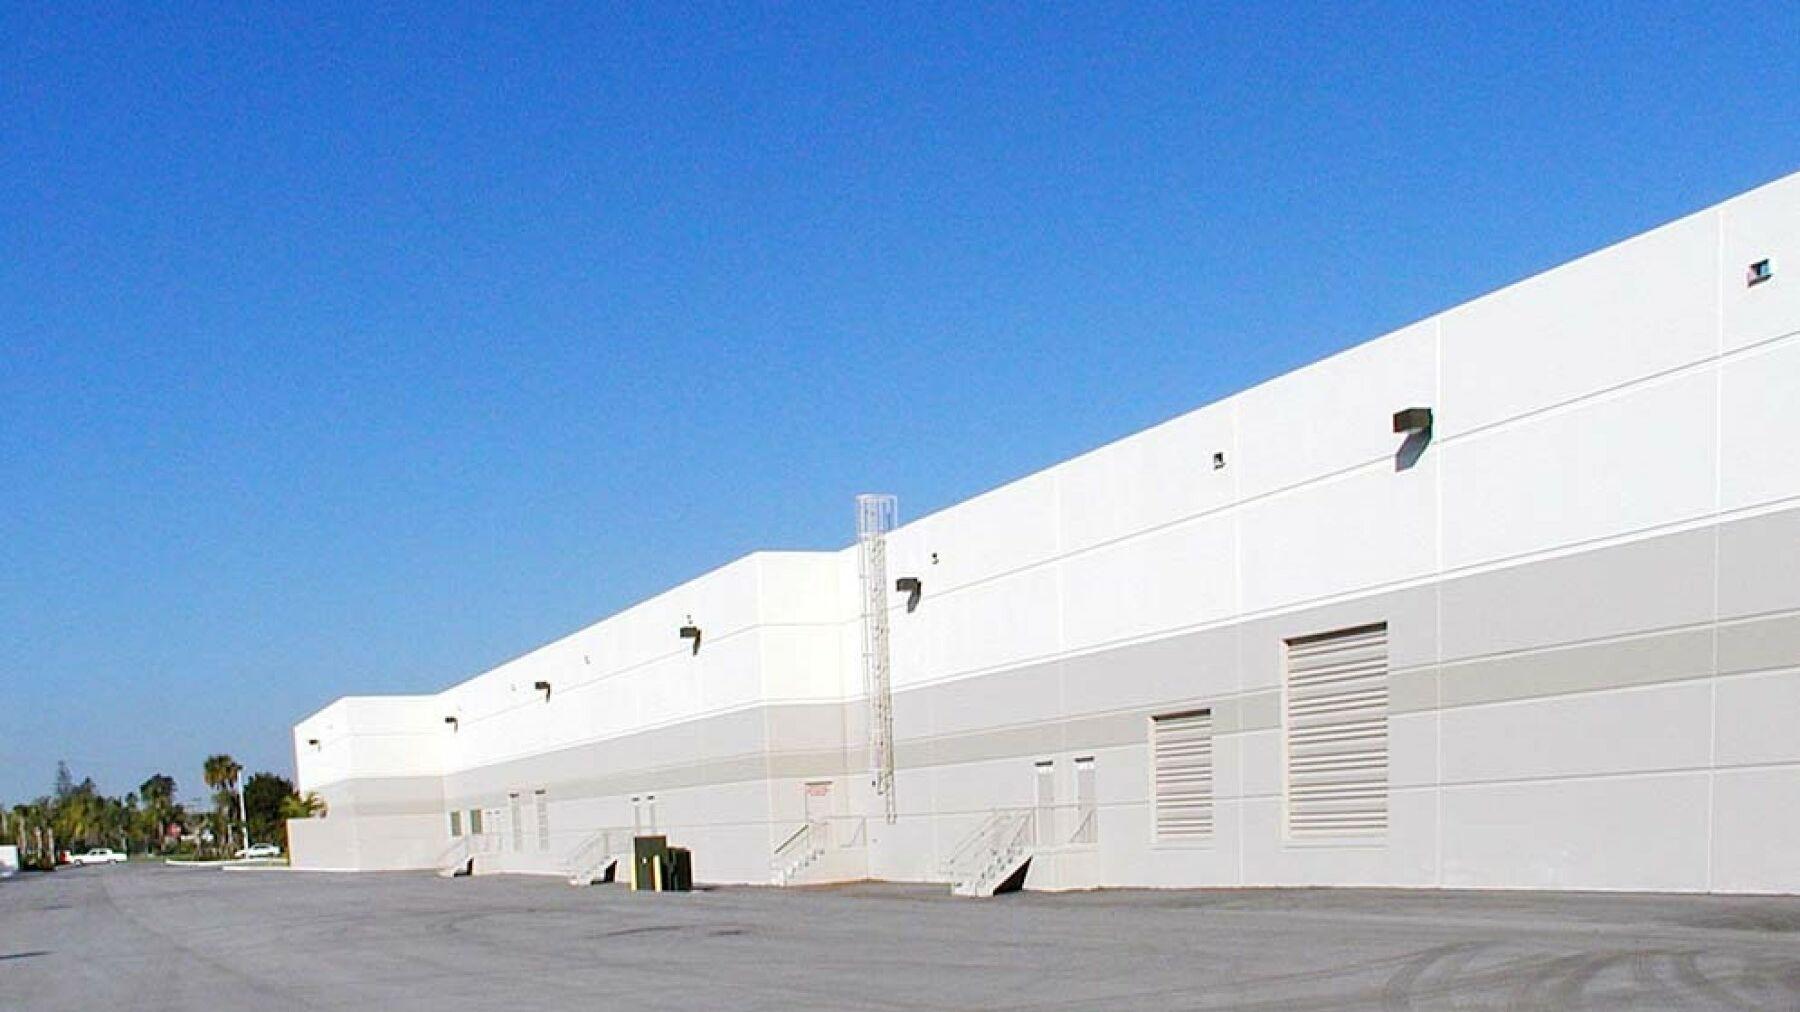 DPM-PBC01003-Northpoint-1400-Dock-Doors-2-Photo.jpg